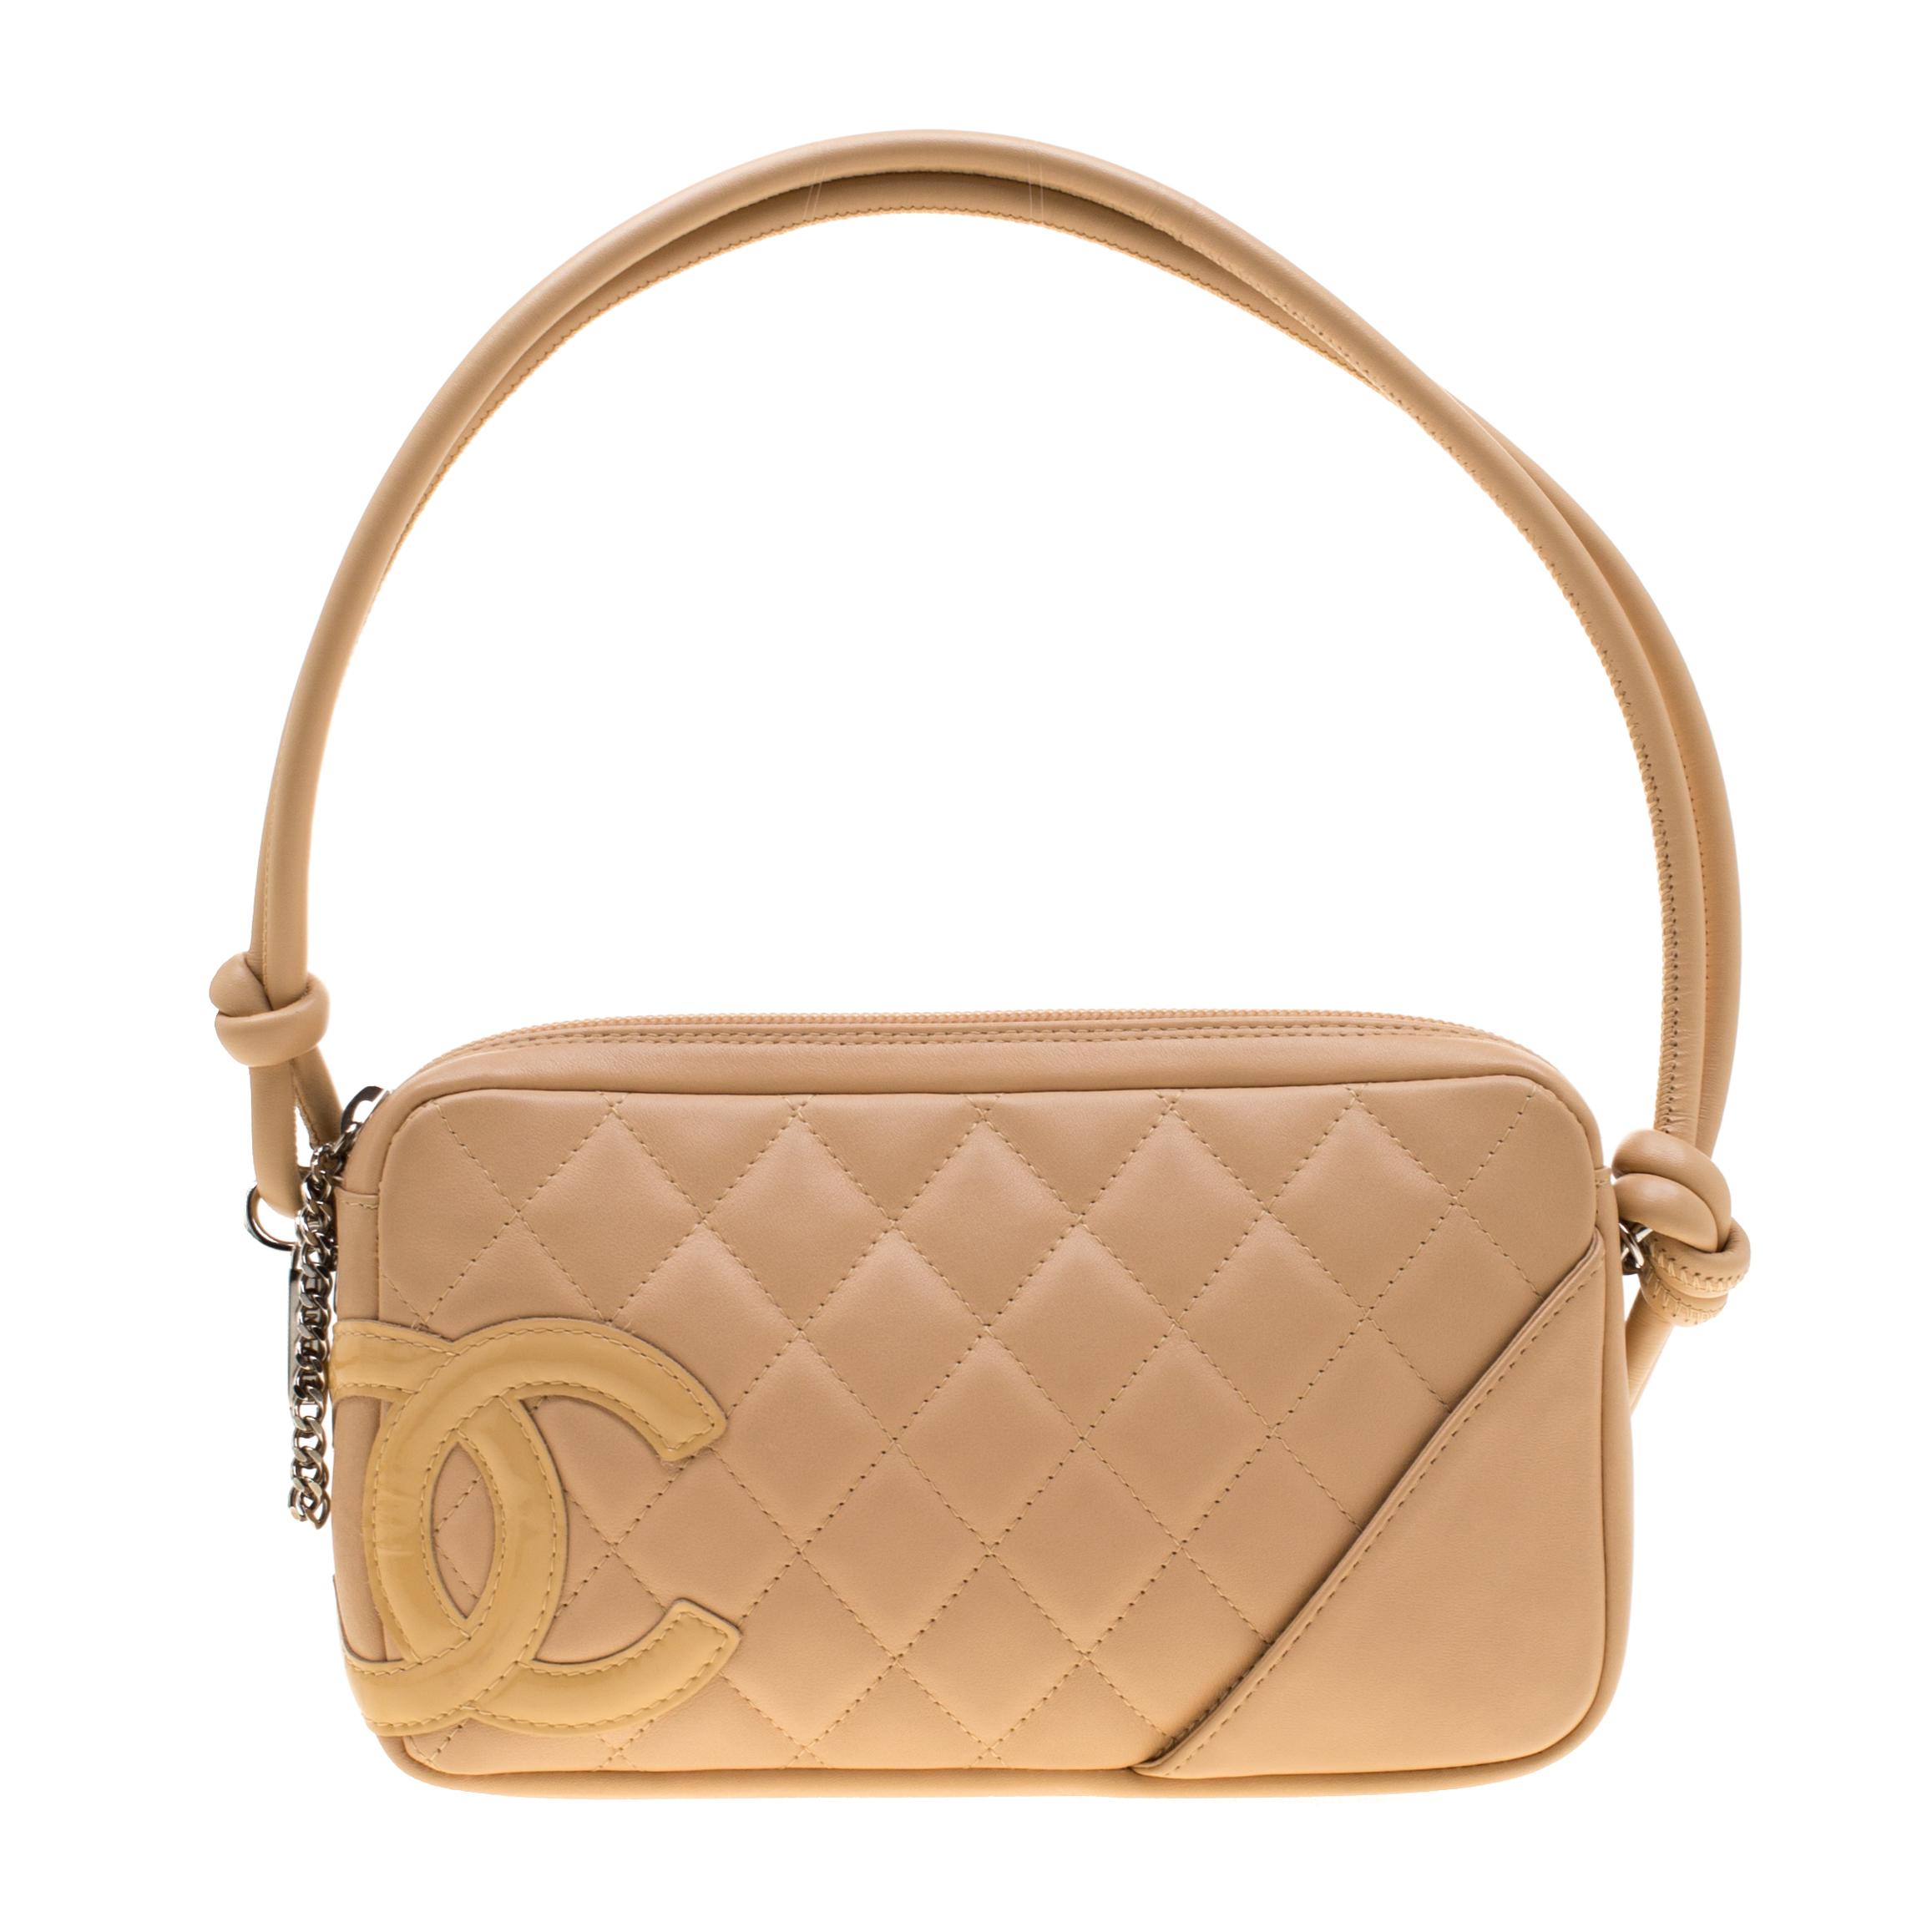 Chanel Cream Quilted Leather Ligne Cambon Pochette